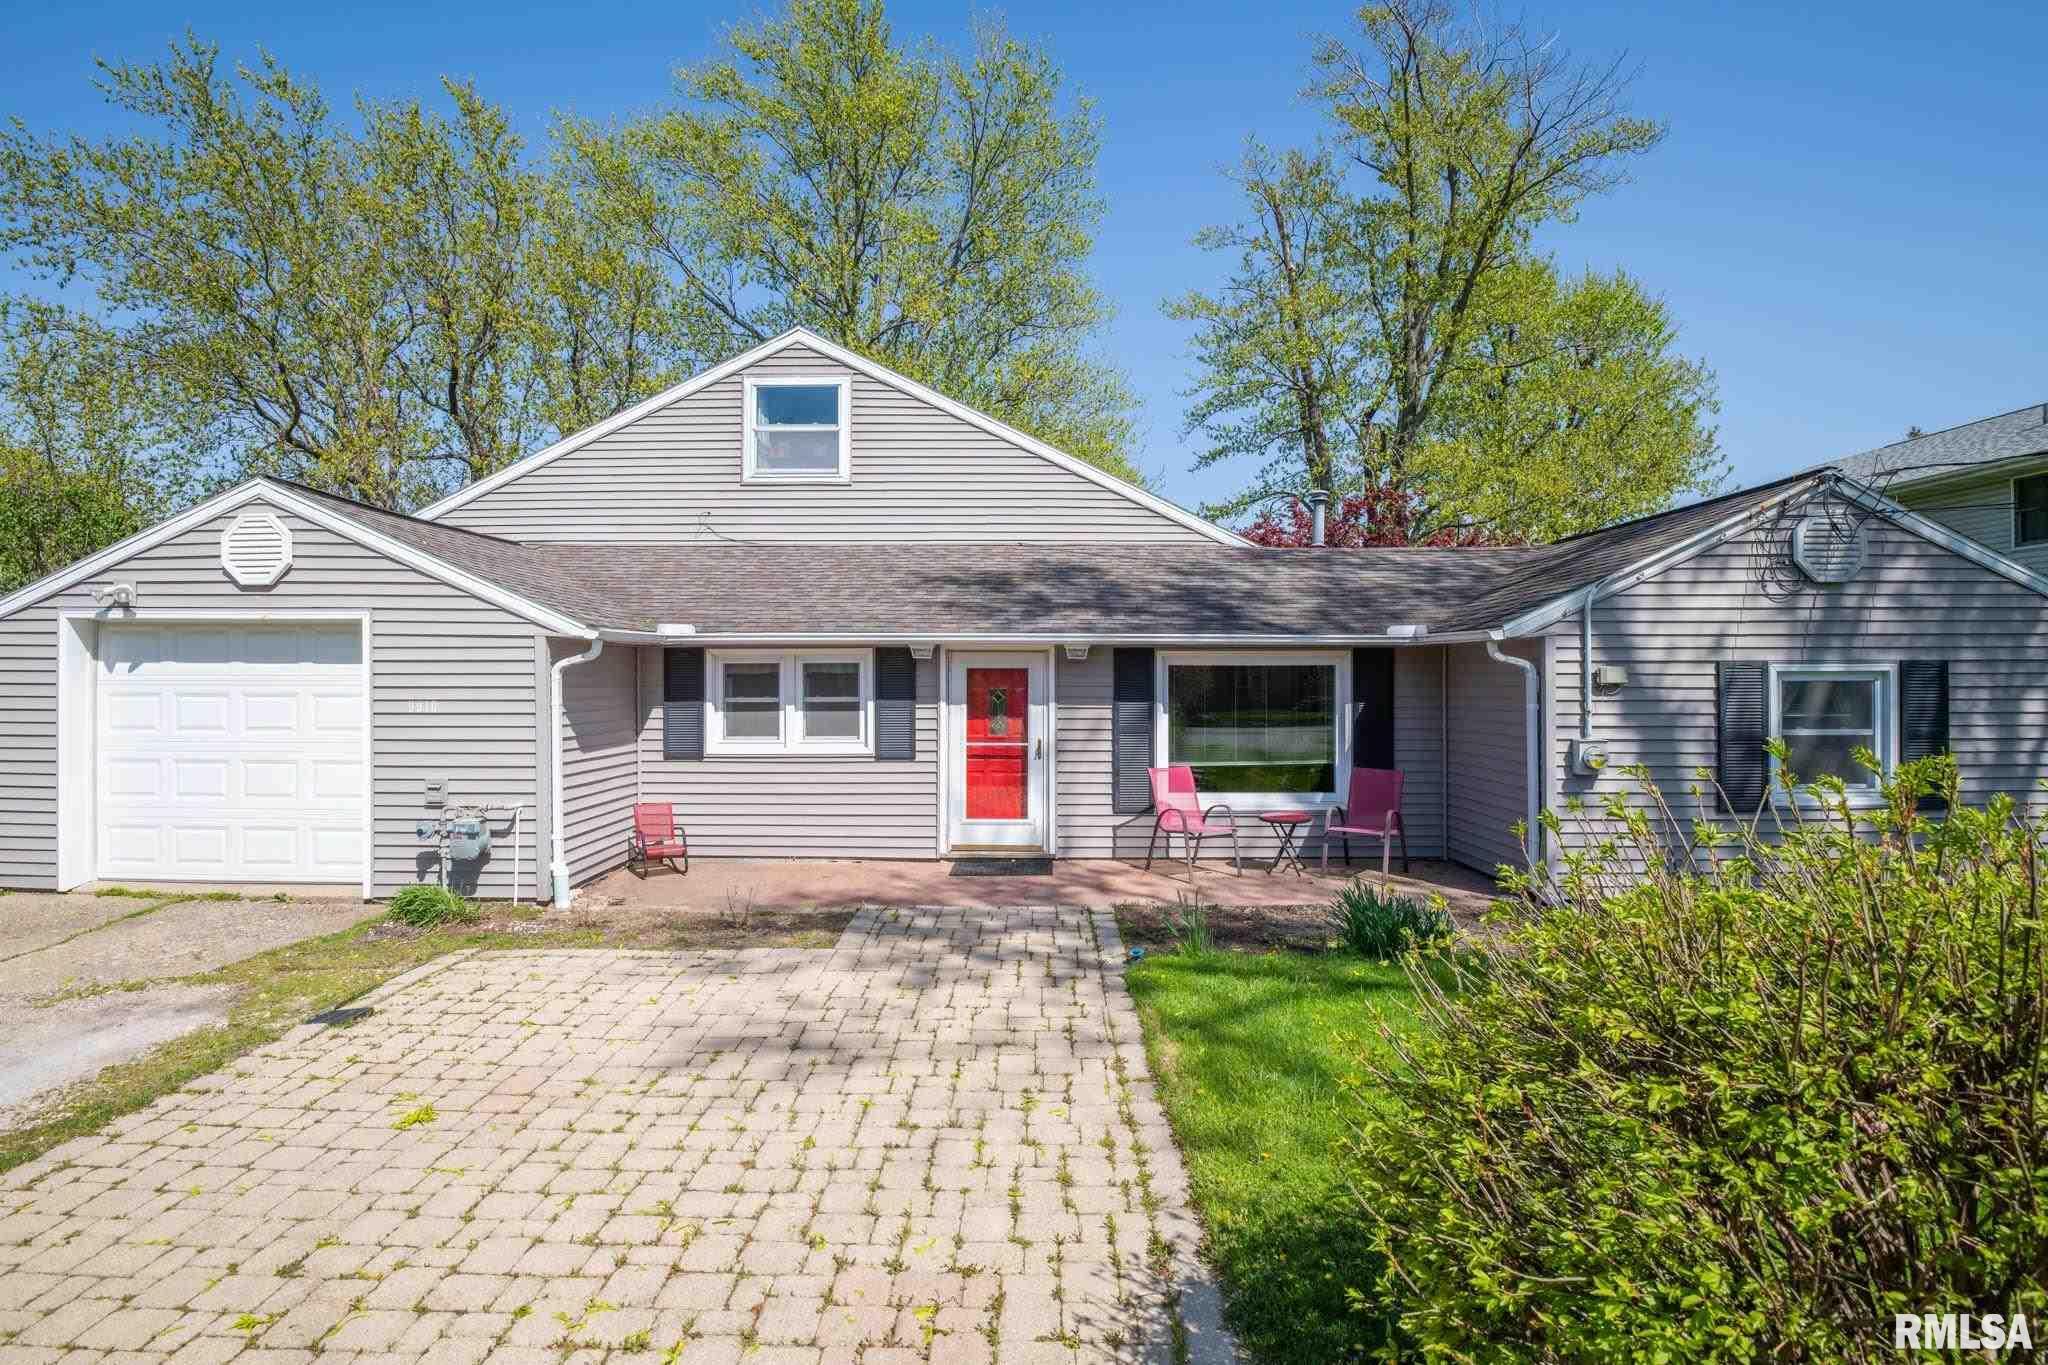 9910 N GARDEN Property Photo - Peoria, IL real estate listing